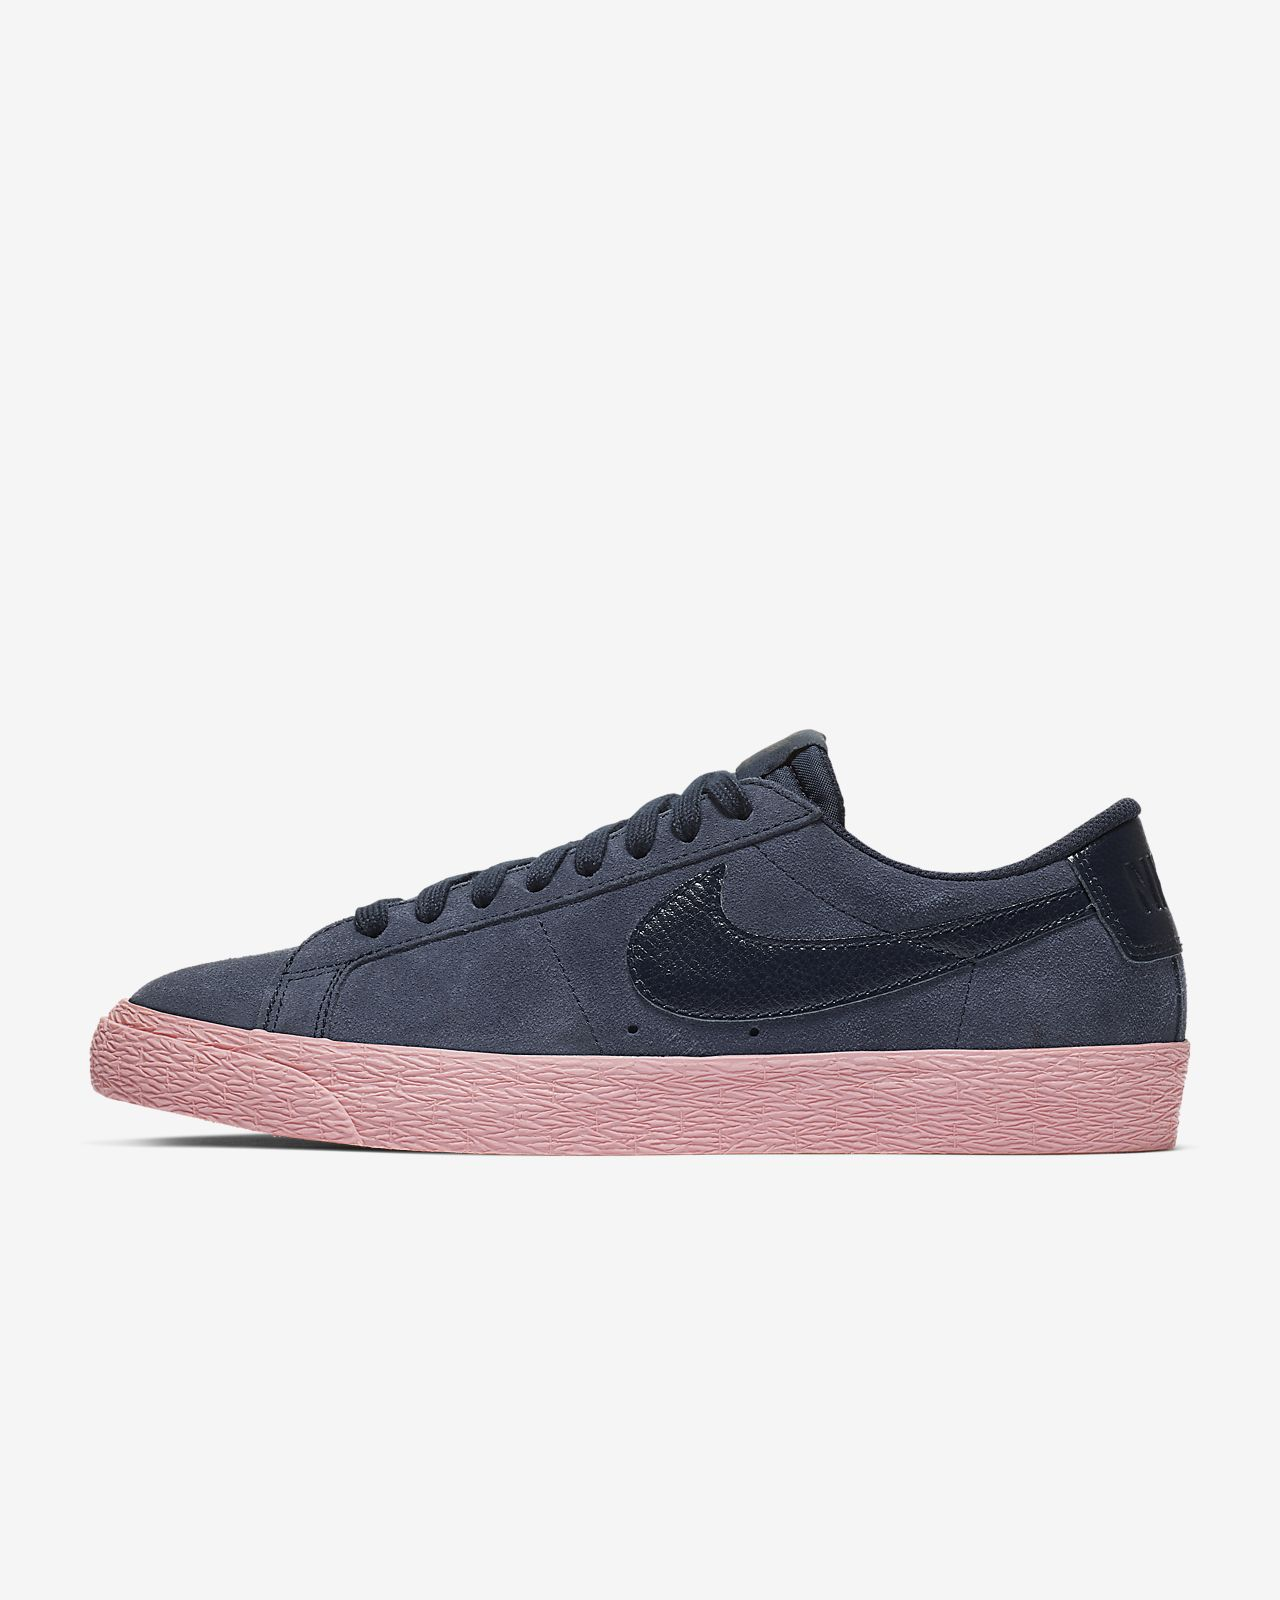 size 40 aeac5 f0486 ... Chaussure de skateboard Nike SB Blazer Zoom Low pour Homme